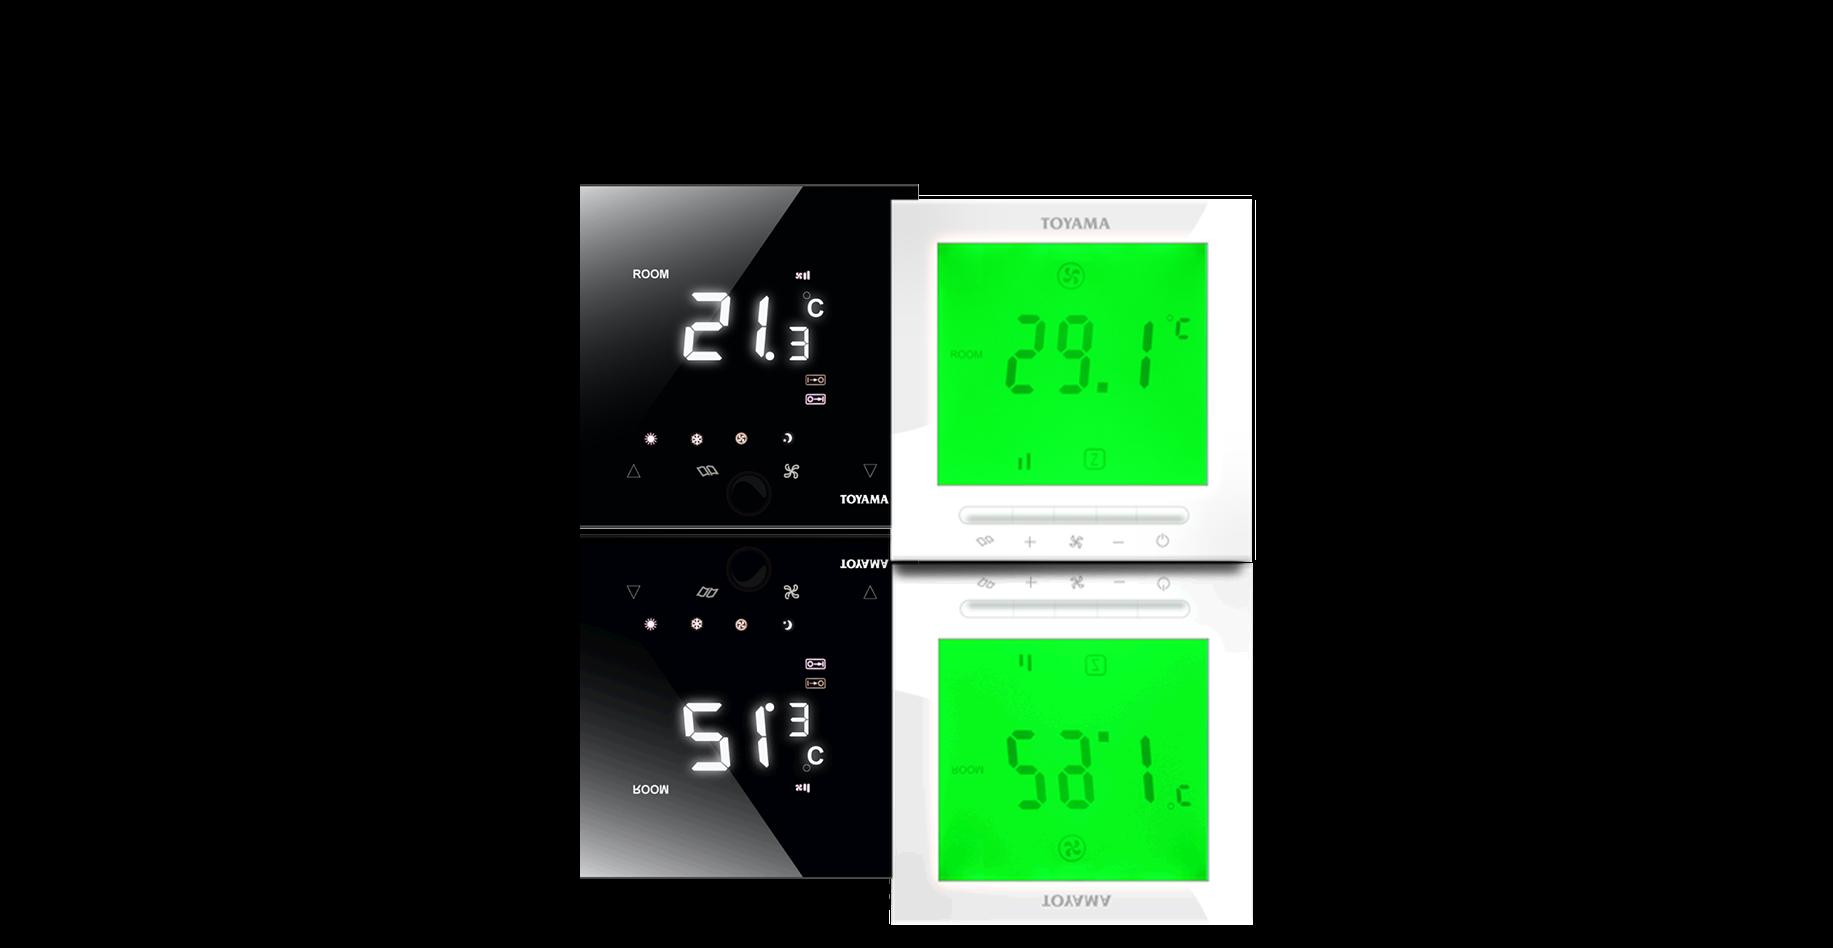 Toyama Controls - Thermostat